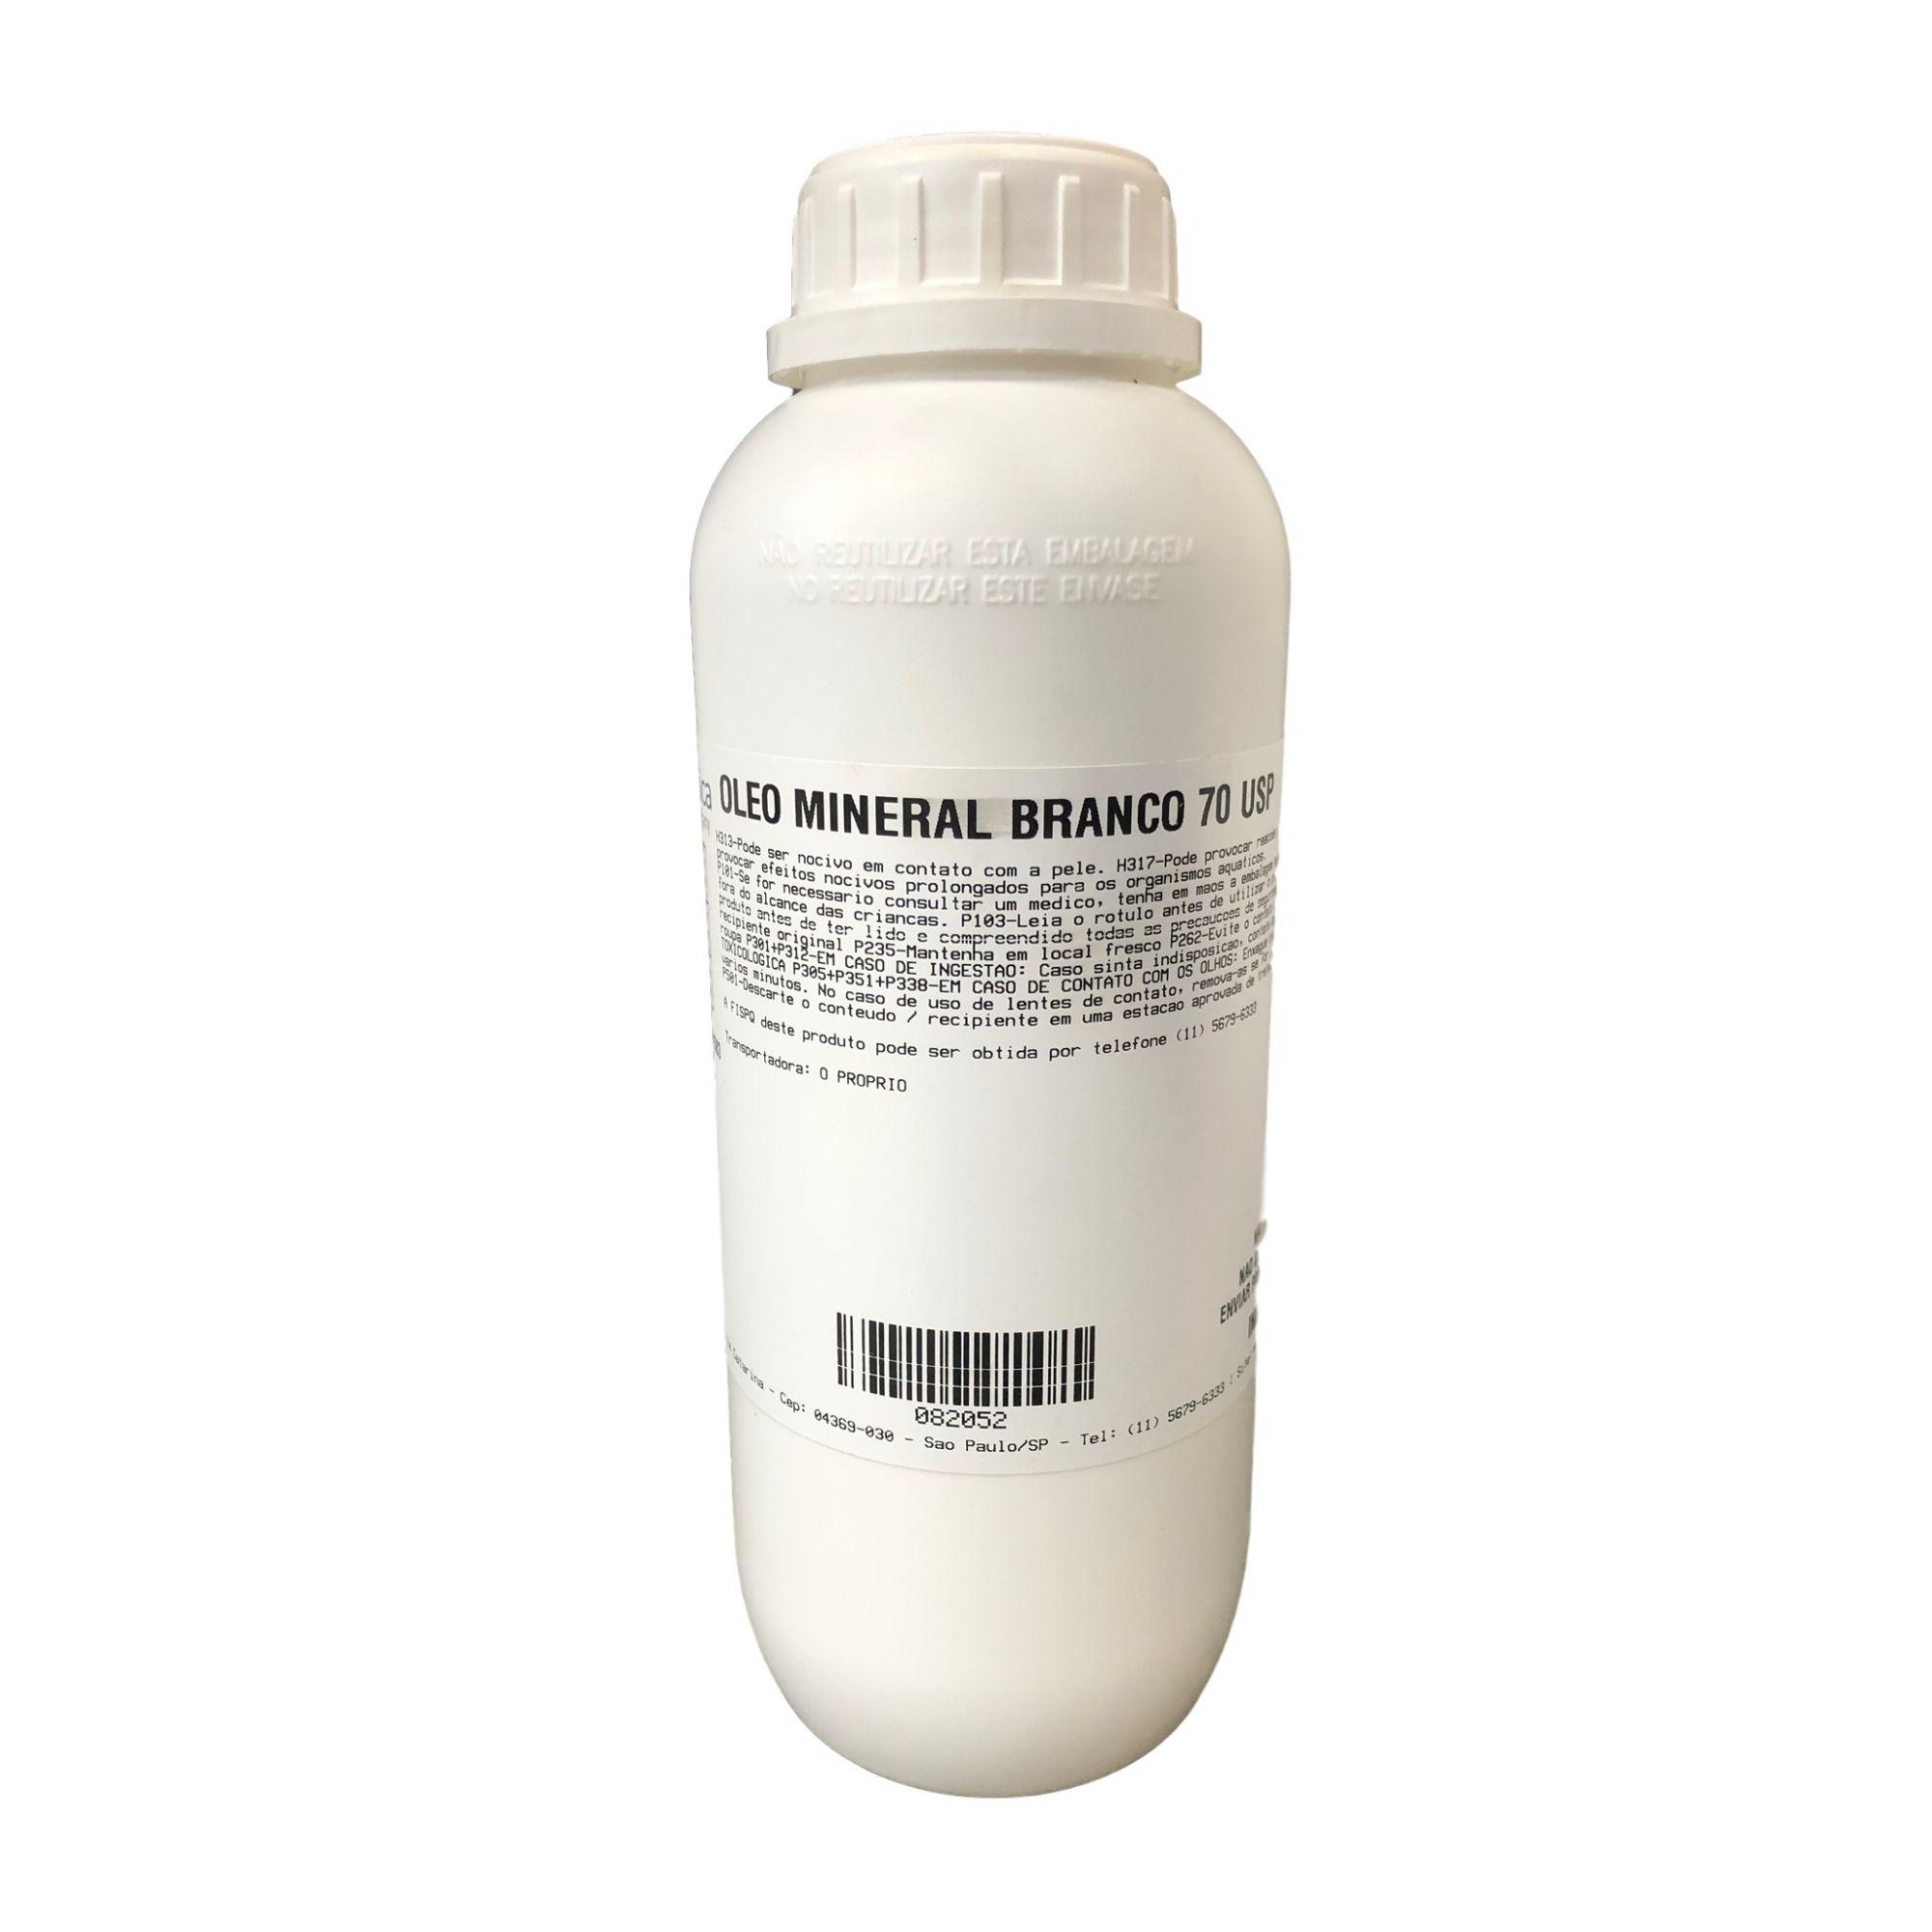 Óleo Mineral Branco USP - 50 Litros   40 Kg